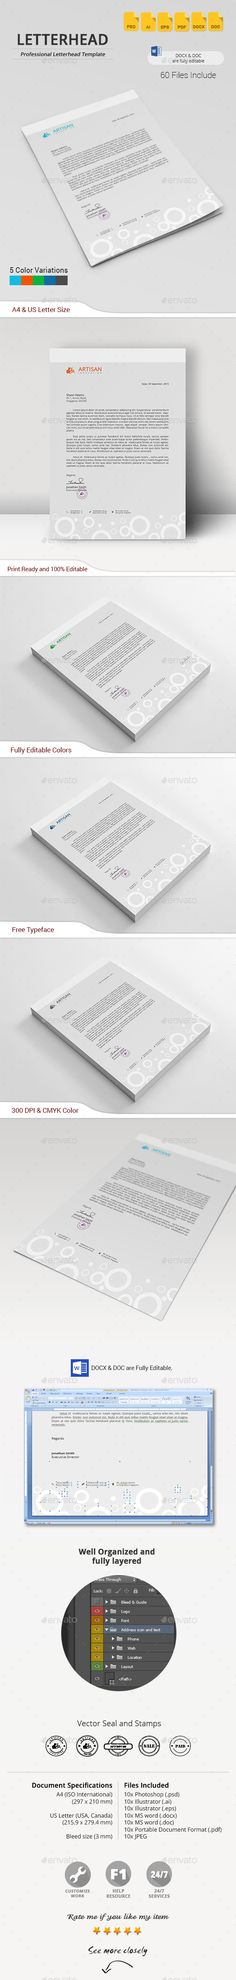 Letterhead More Letterhead, Stationery printing and Letterhead - letterhead templates download